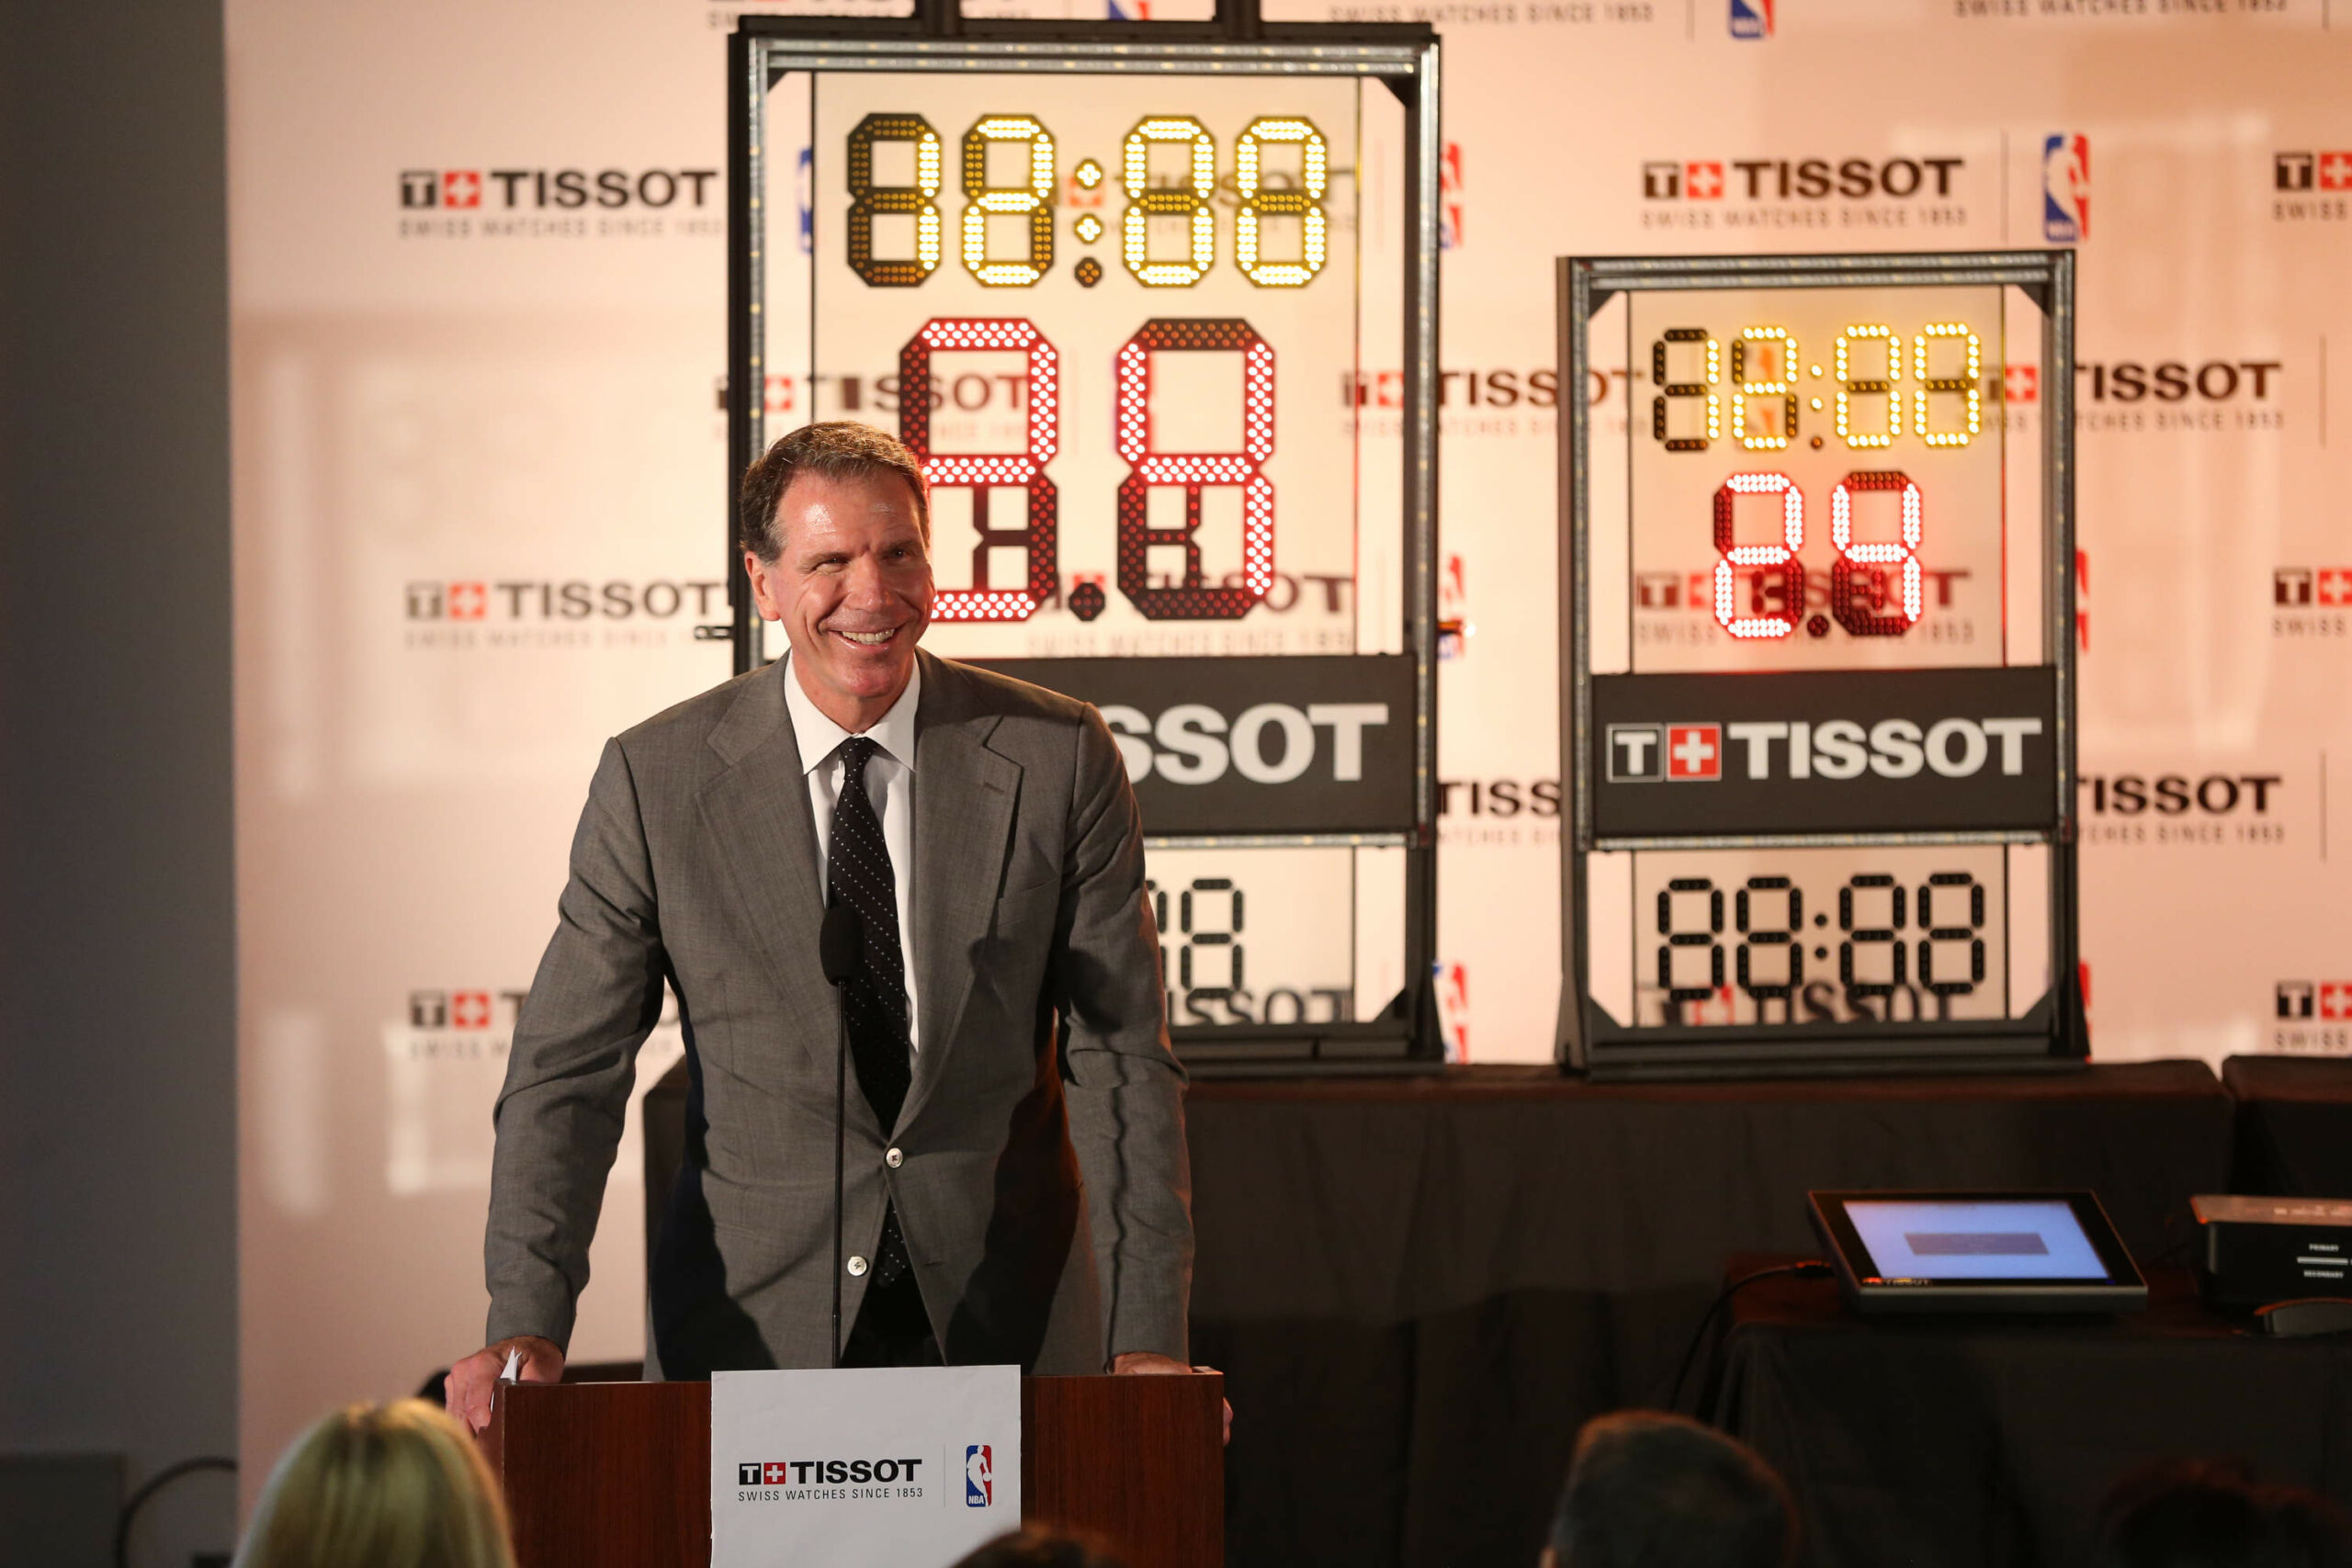 NBA and Tissot announce multiyear renewal